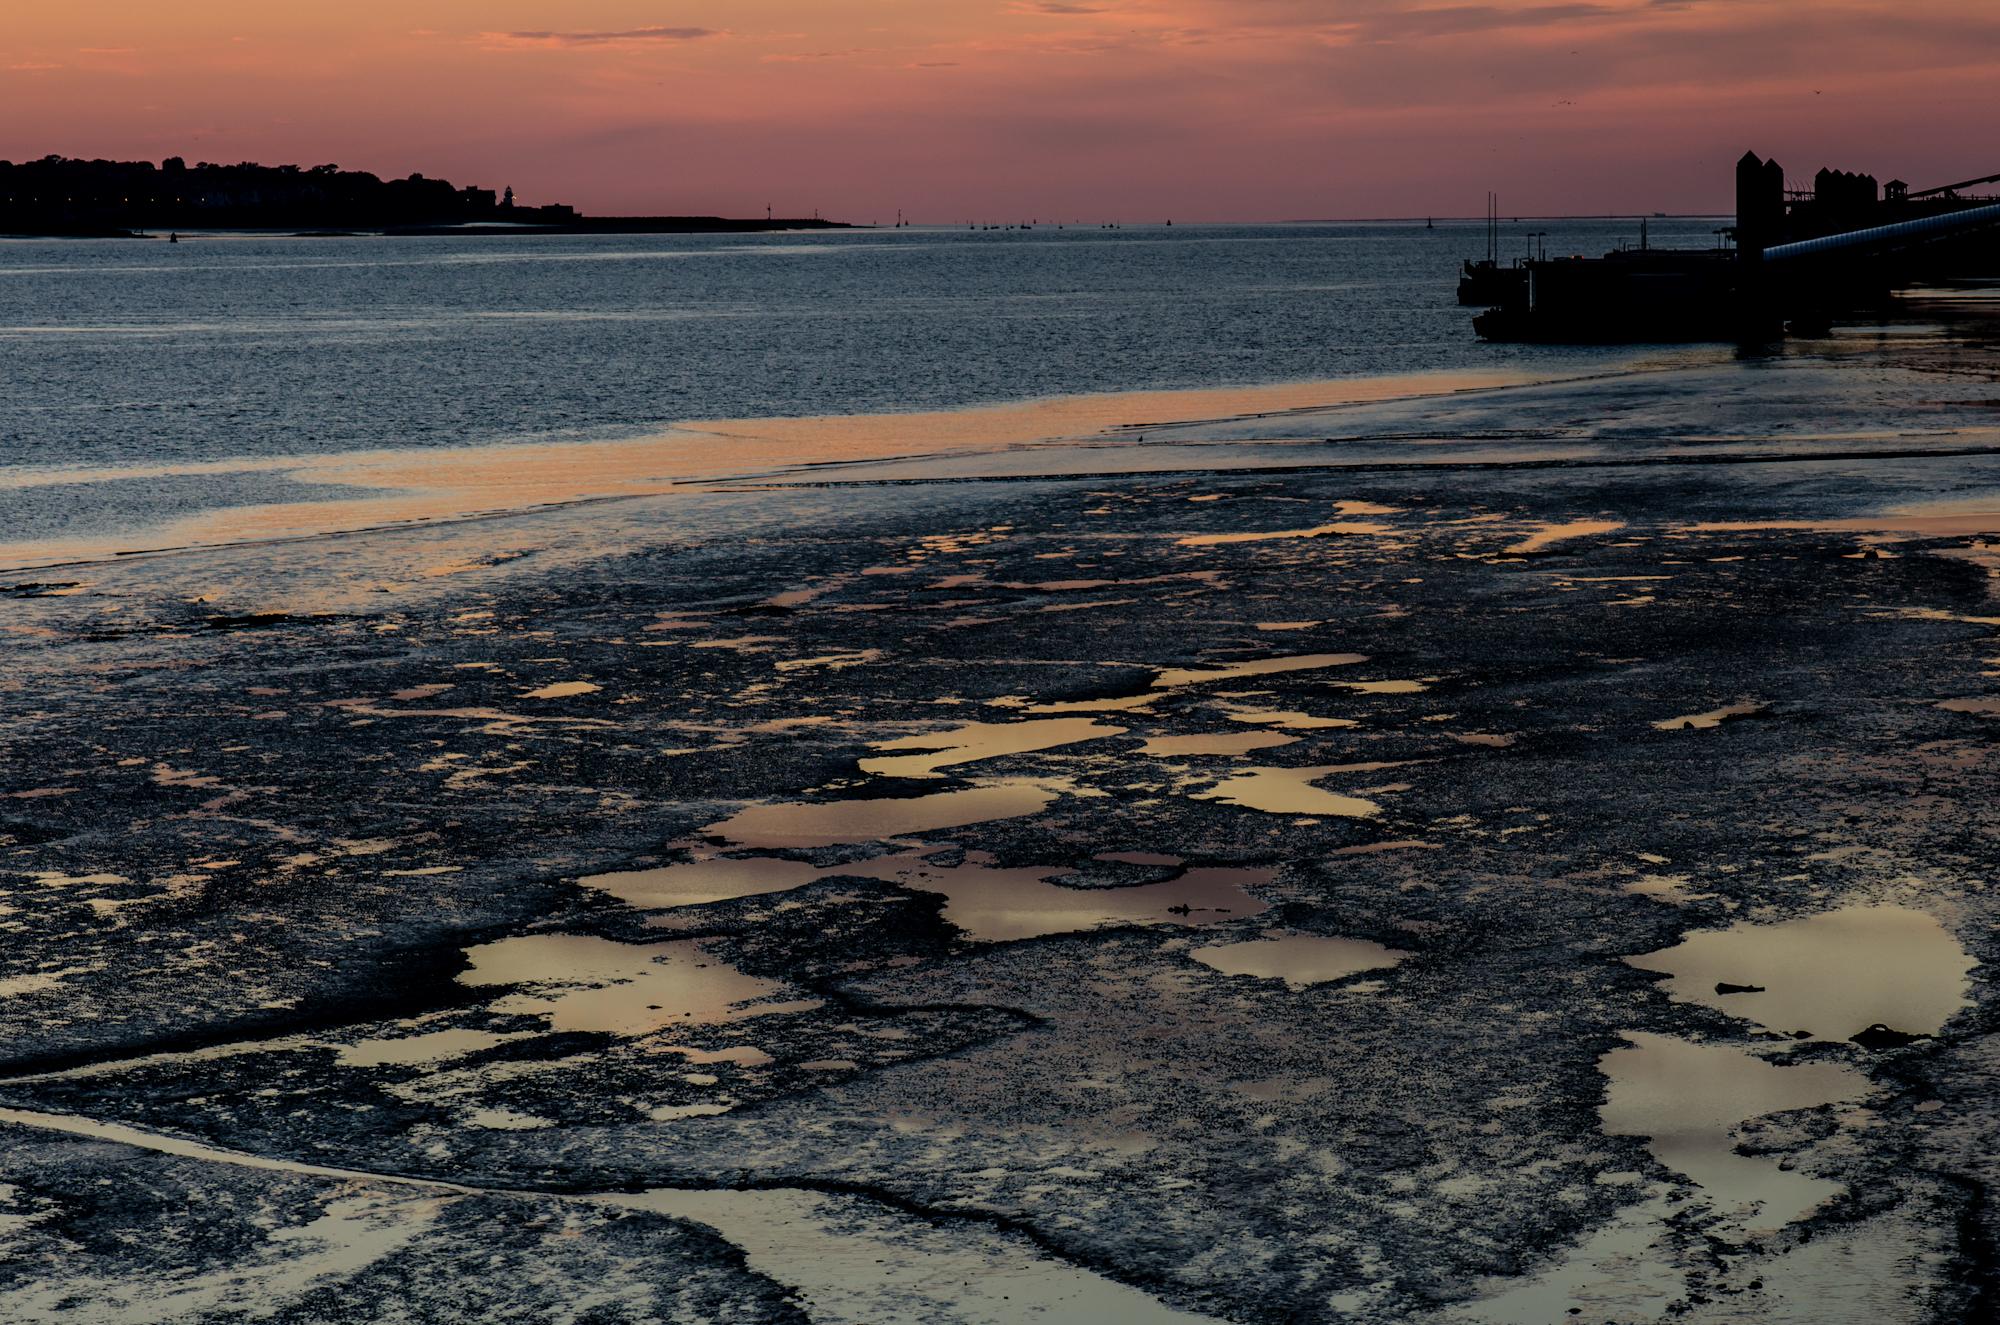 Photo: Mersey docks at dusk